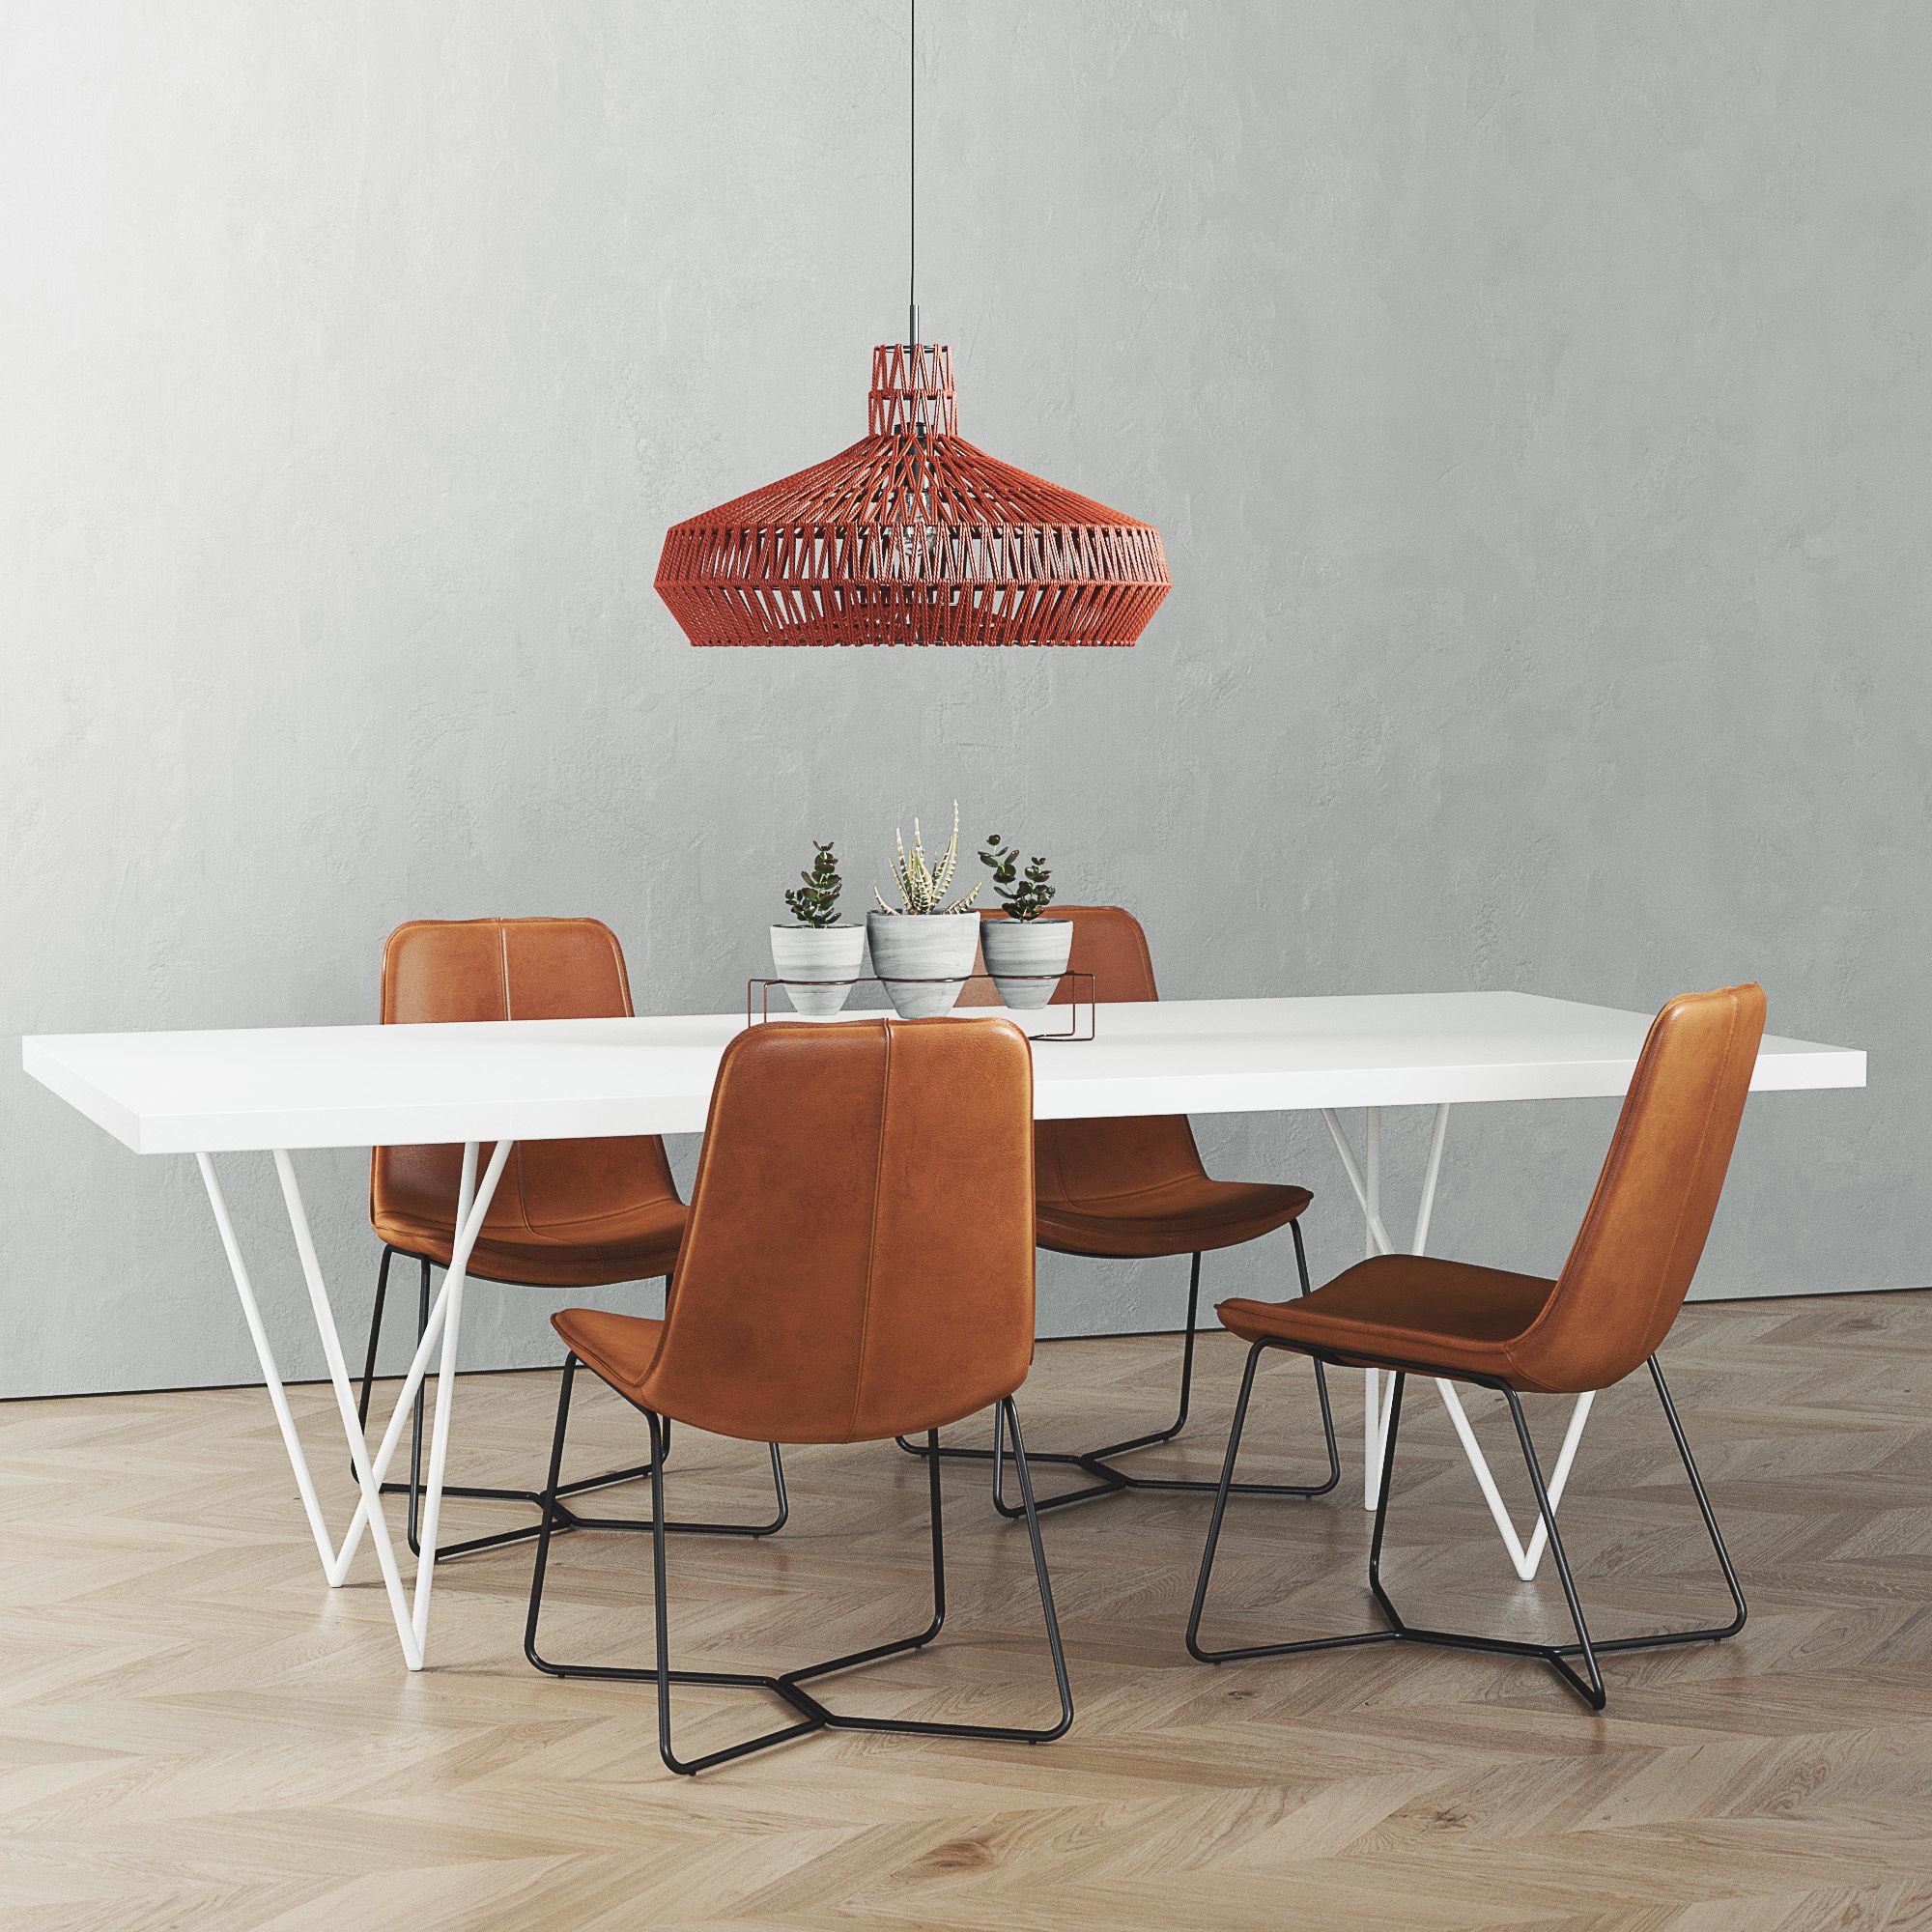 Cb2 Dylan Dining Table Set Model